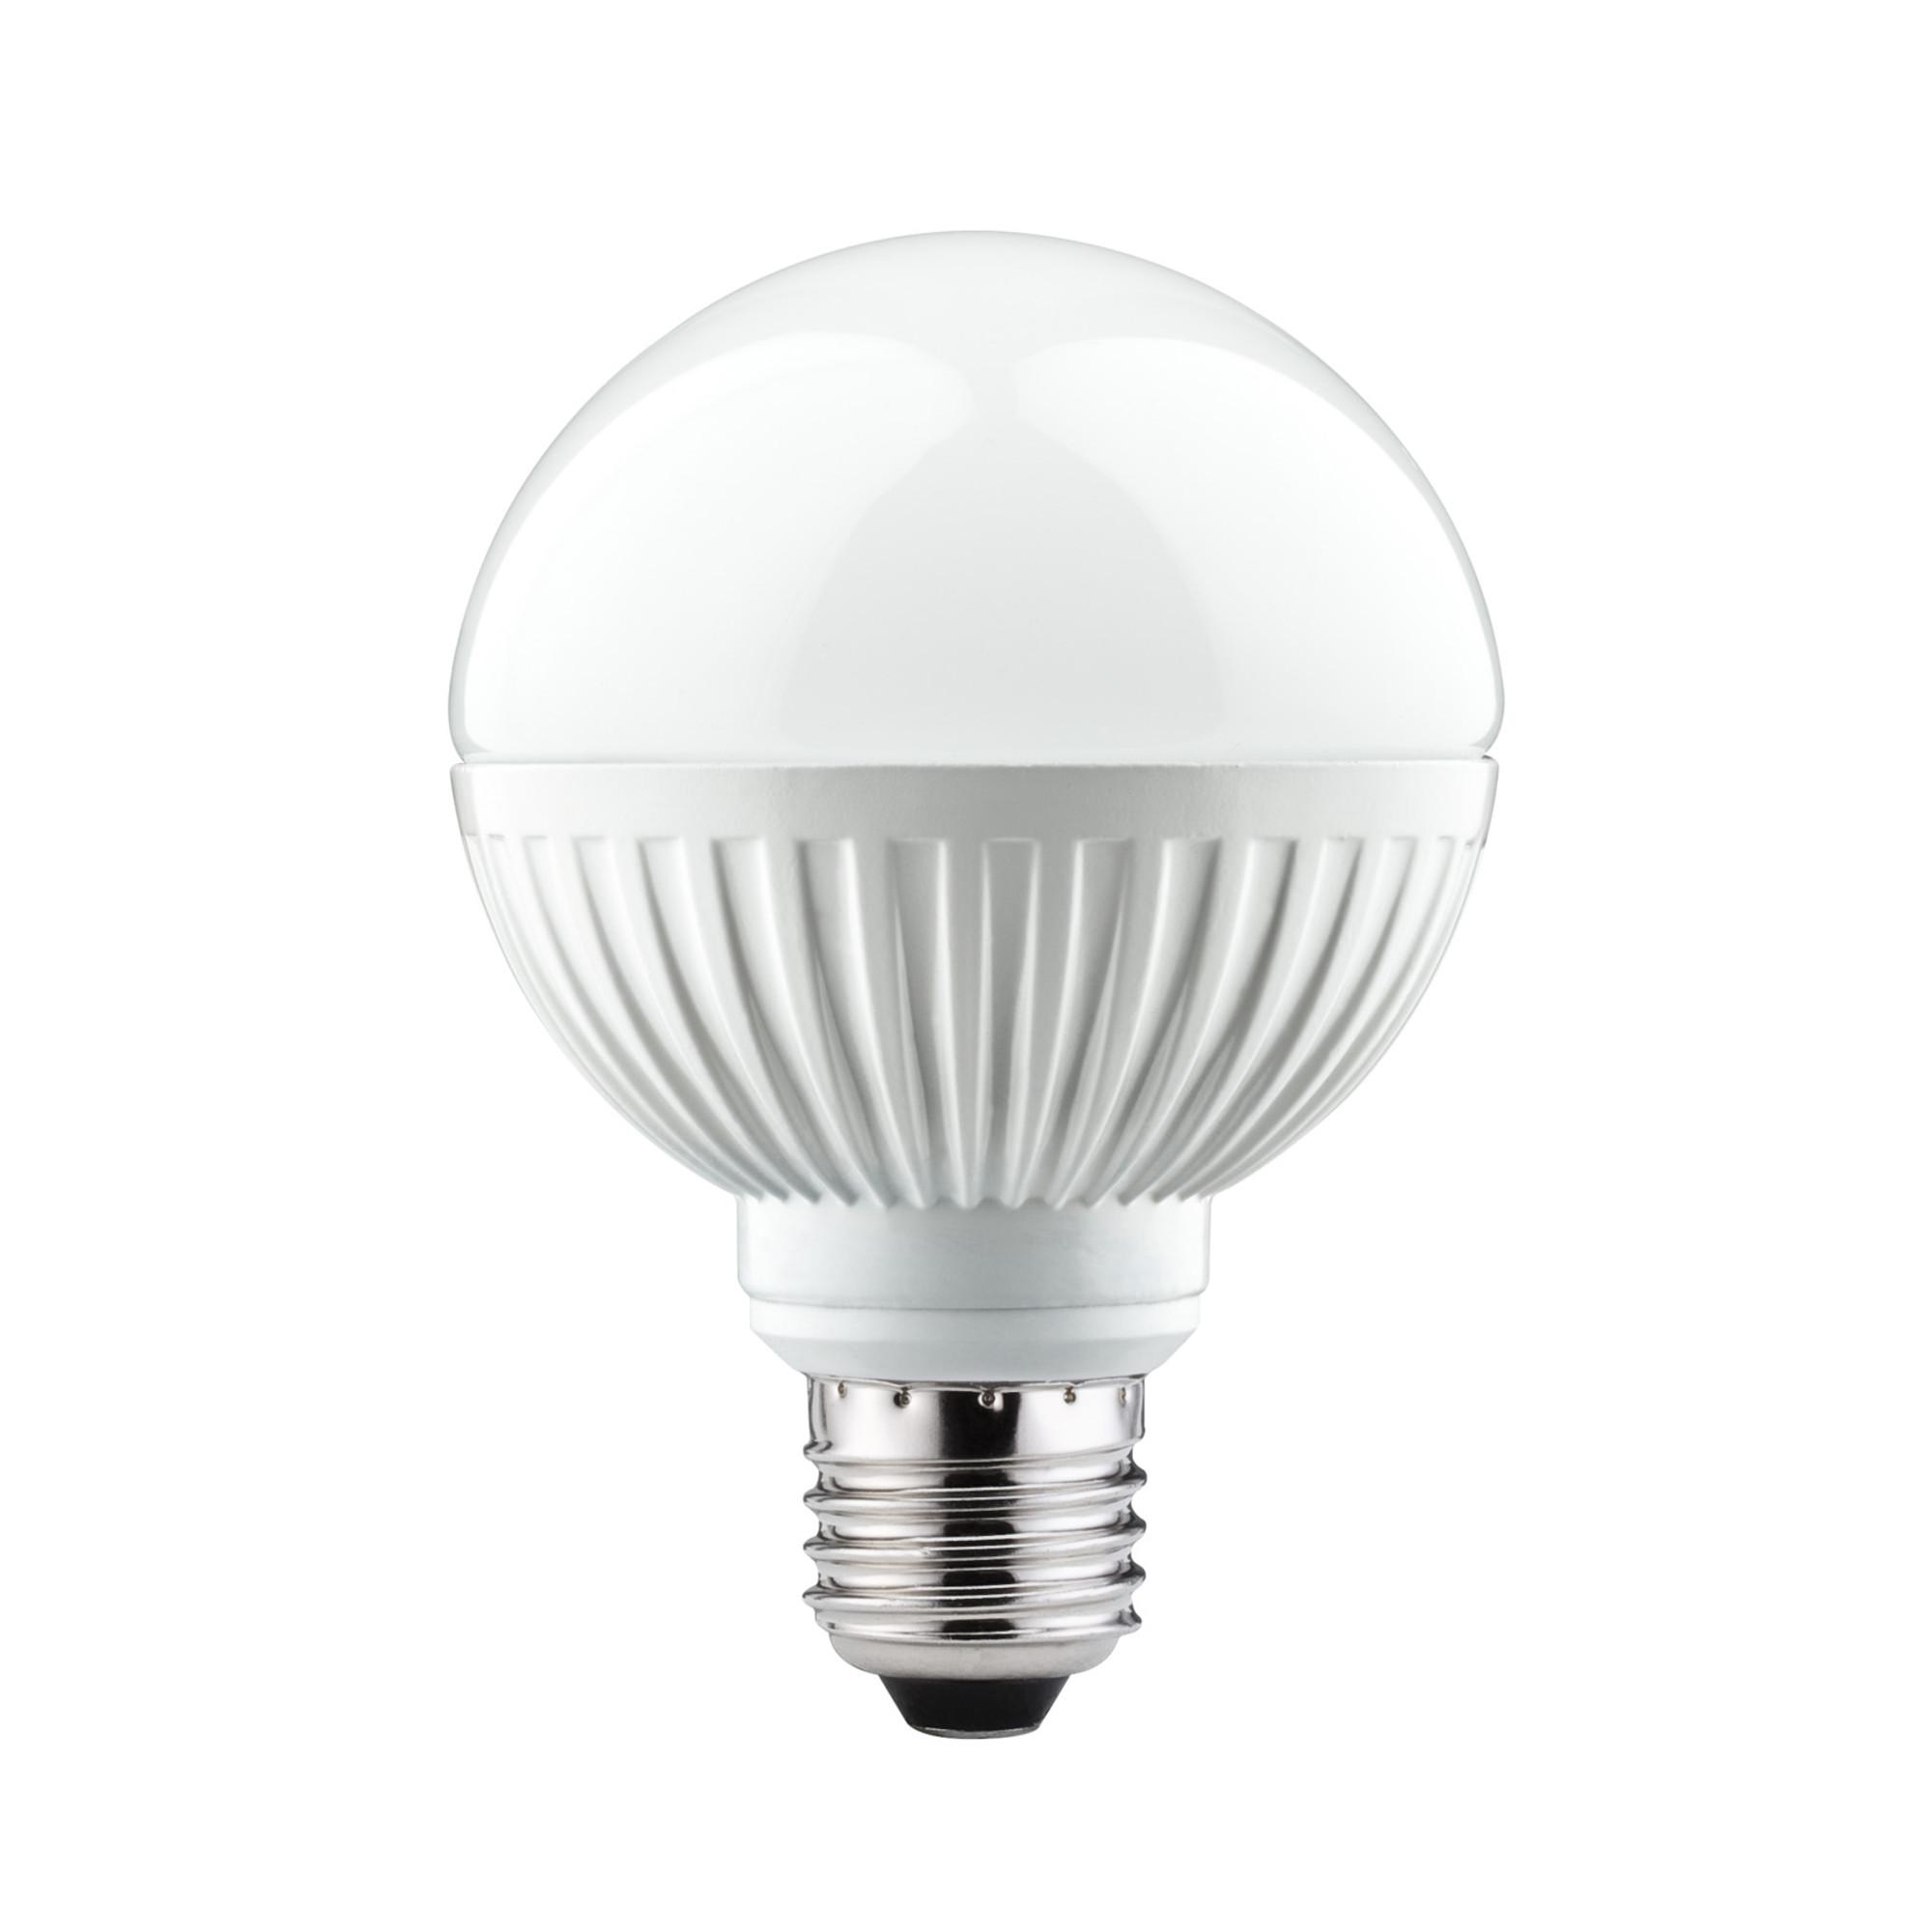 Светодиодная лампочка Paulmann 28354 E27 806 Лм 9.5 Вт